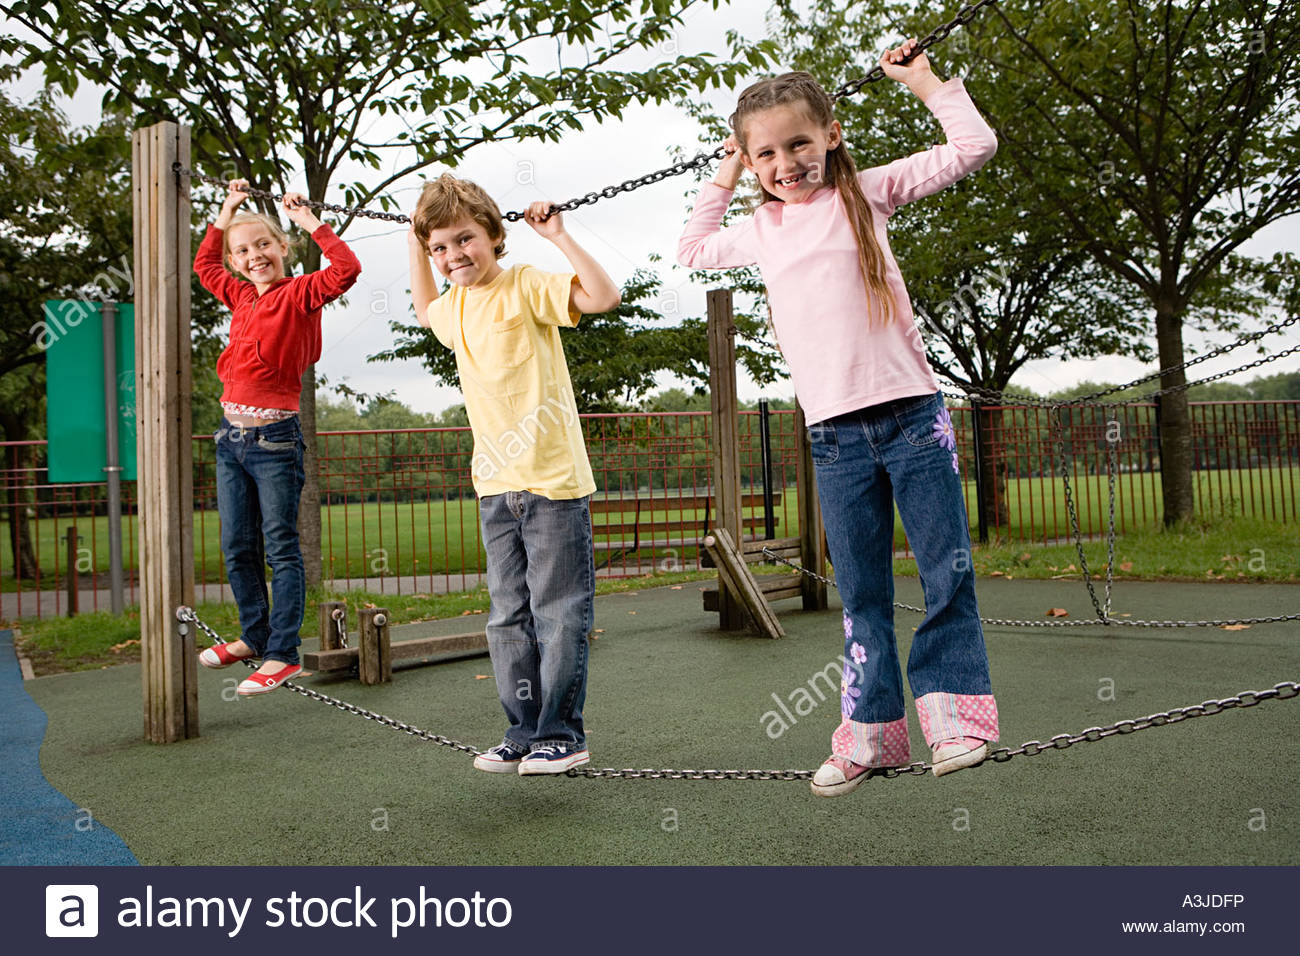 Kinder an einer Kette Stockbild